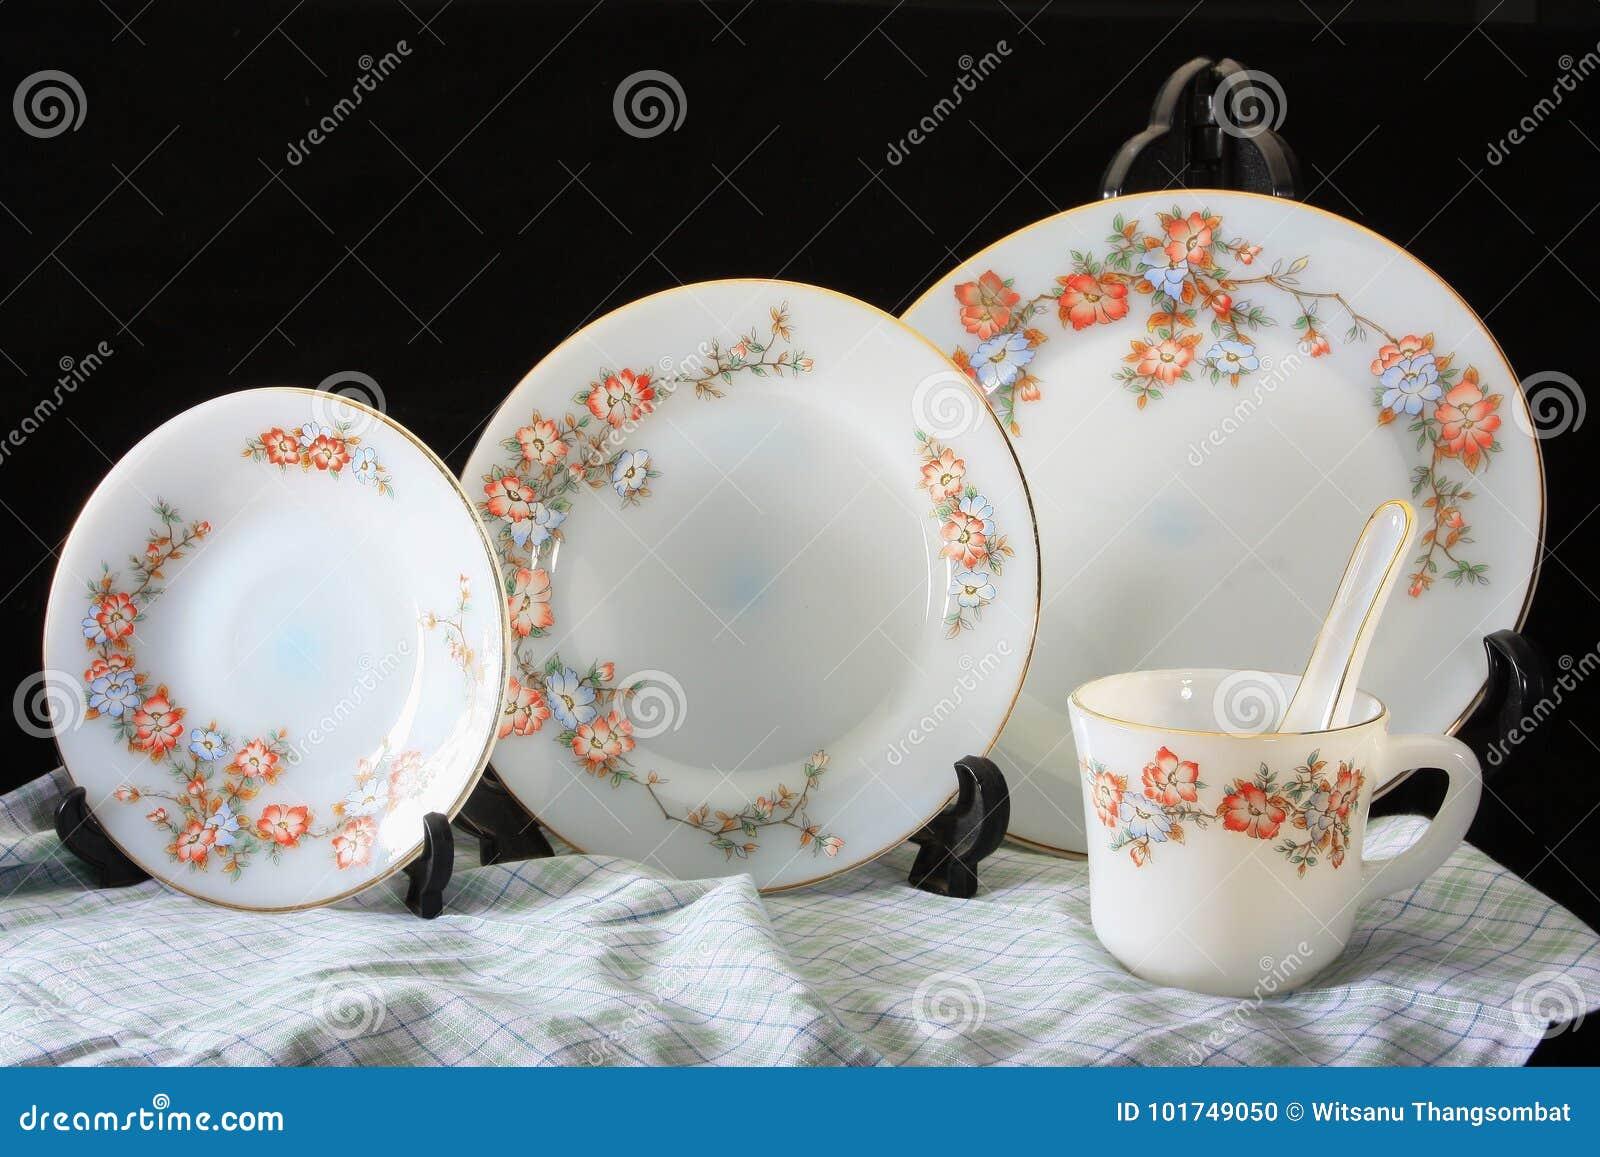 Antique Crockery Set Set Of Tableware Stock Photo Image Of